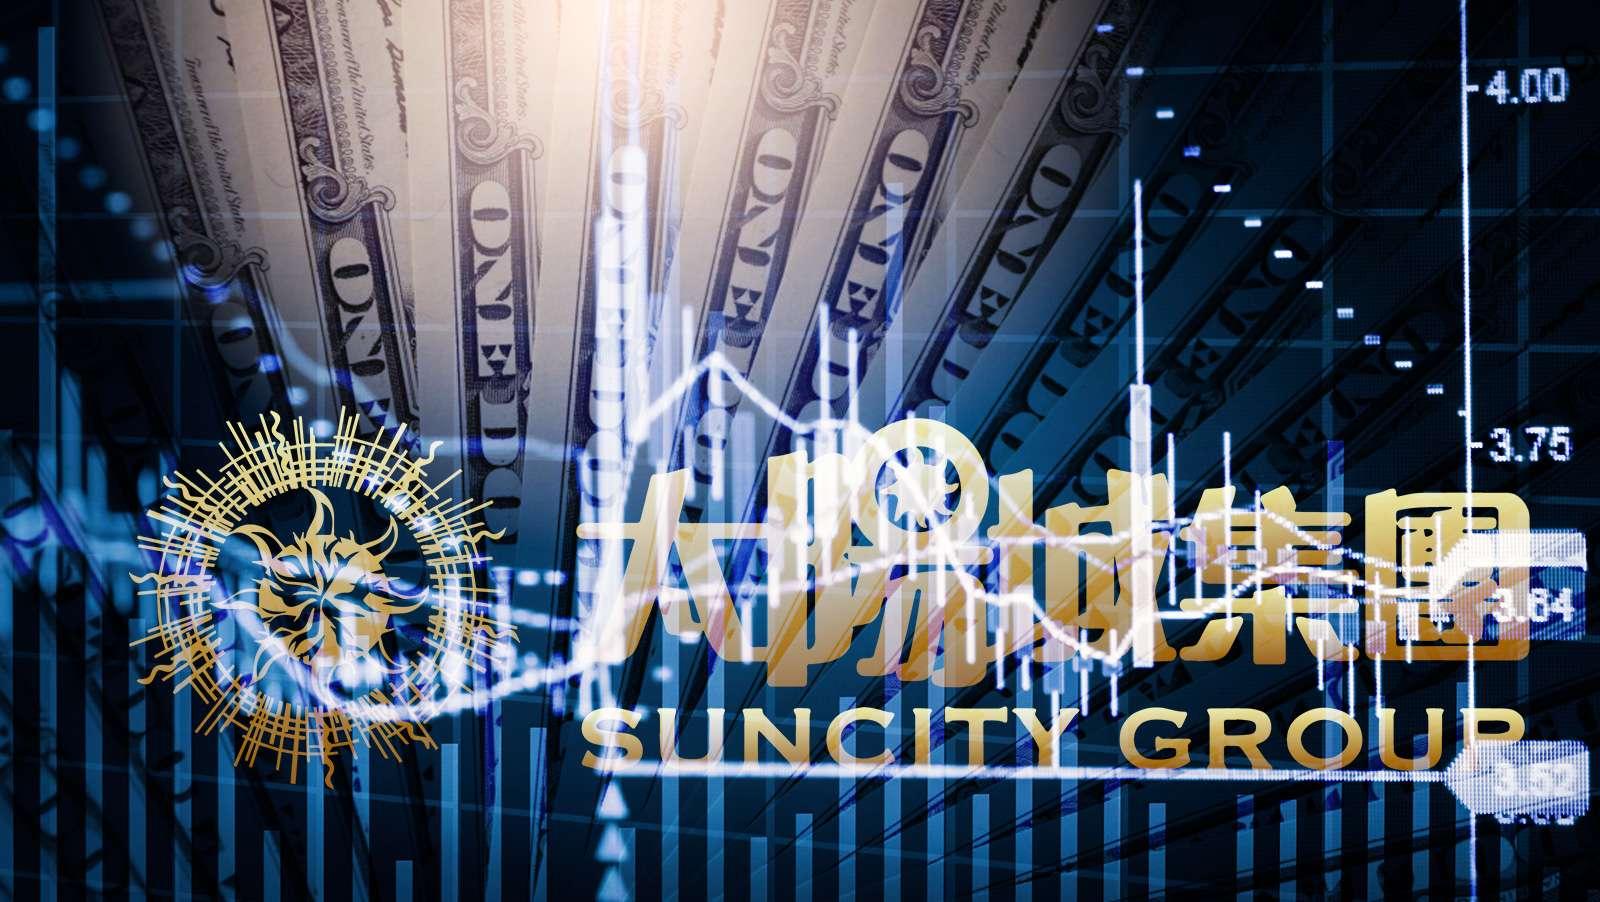 Suncity sees increased revenue in 2018, but still struggling